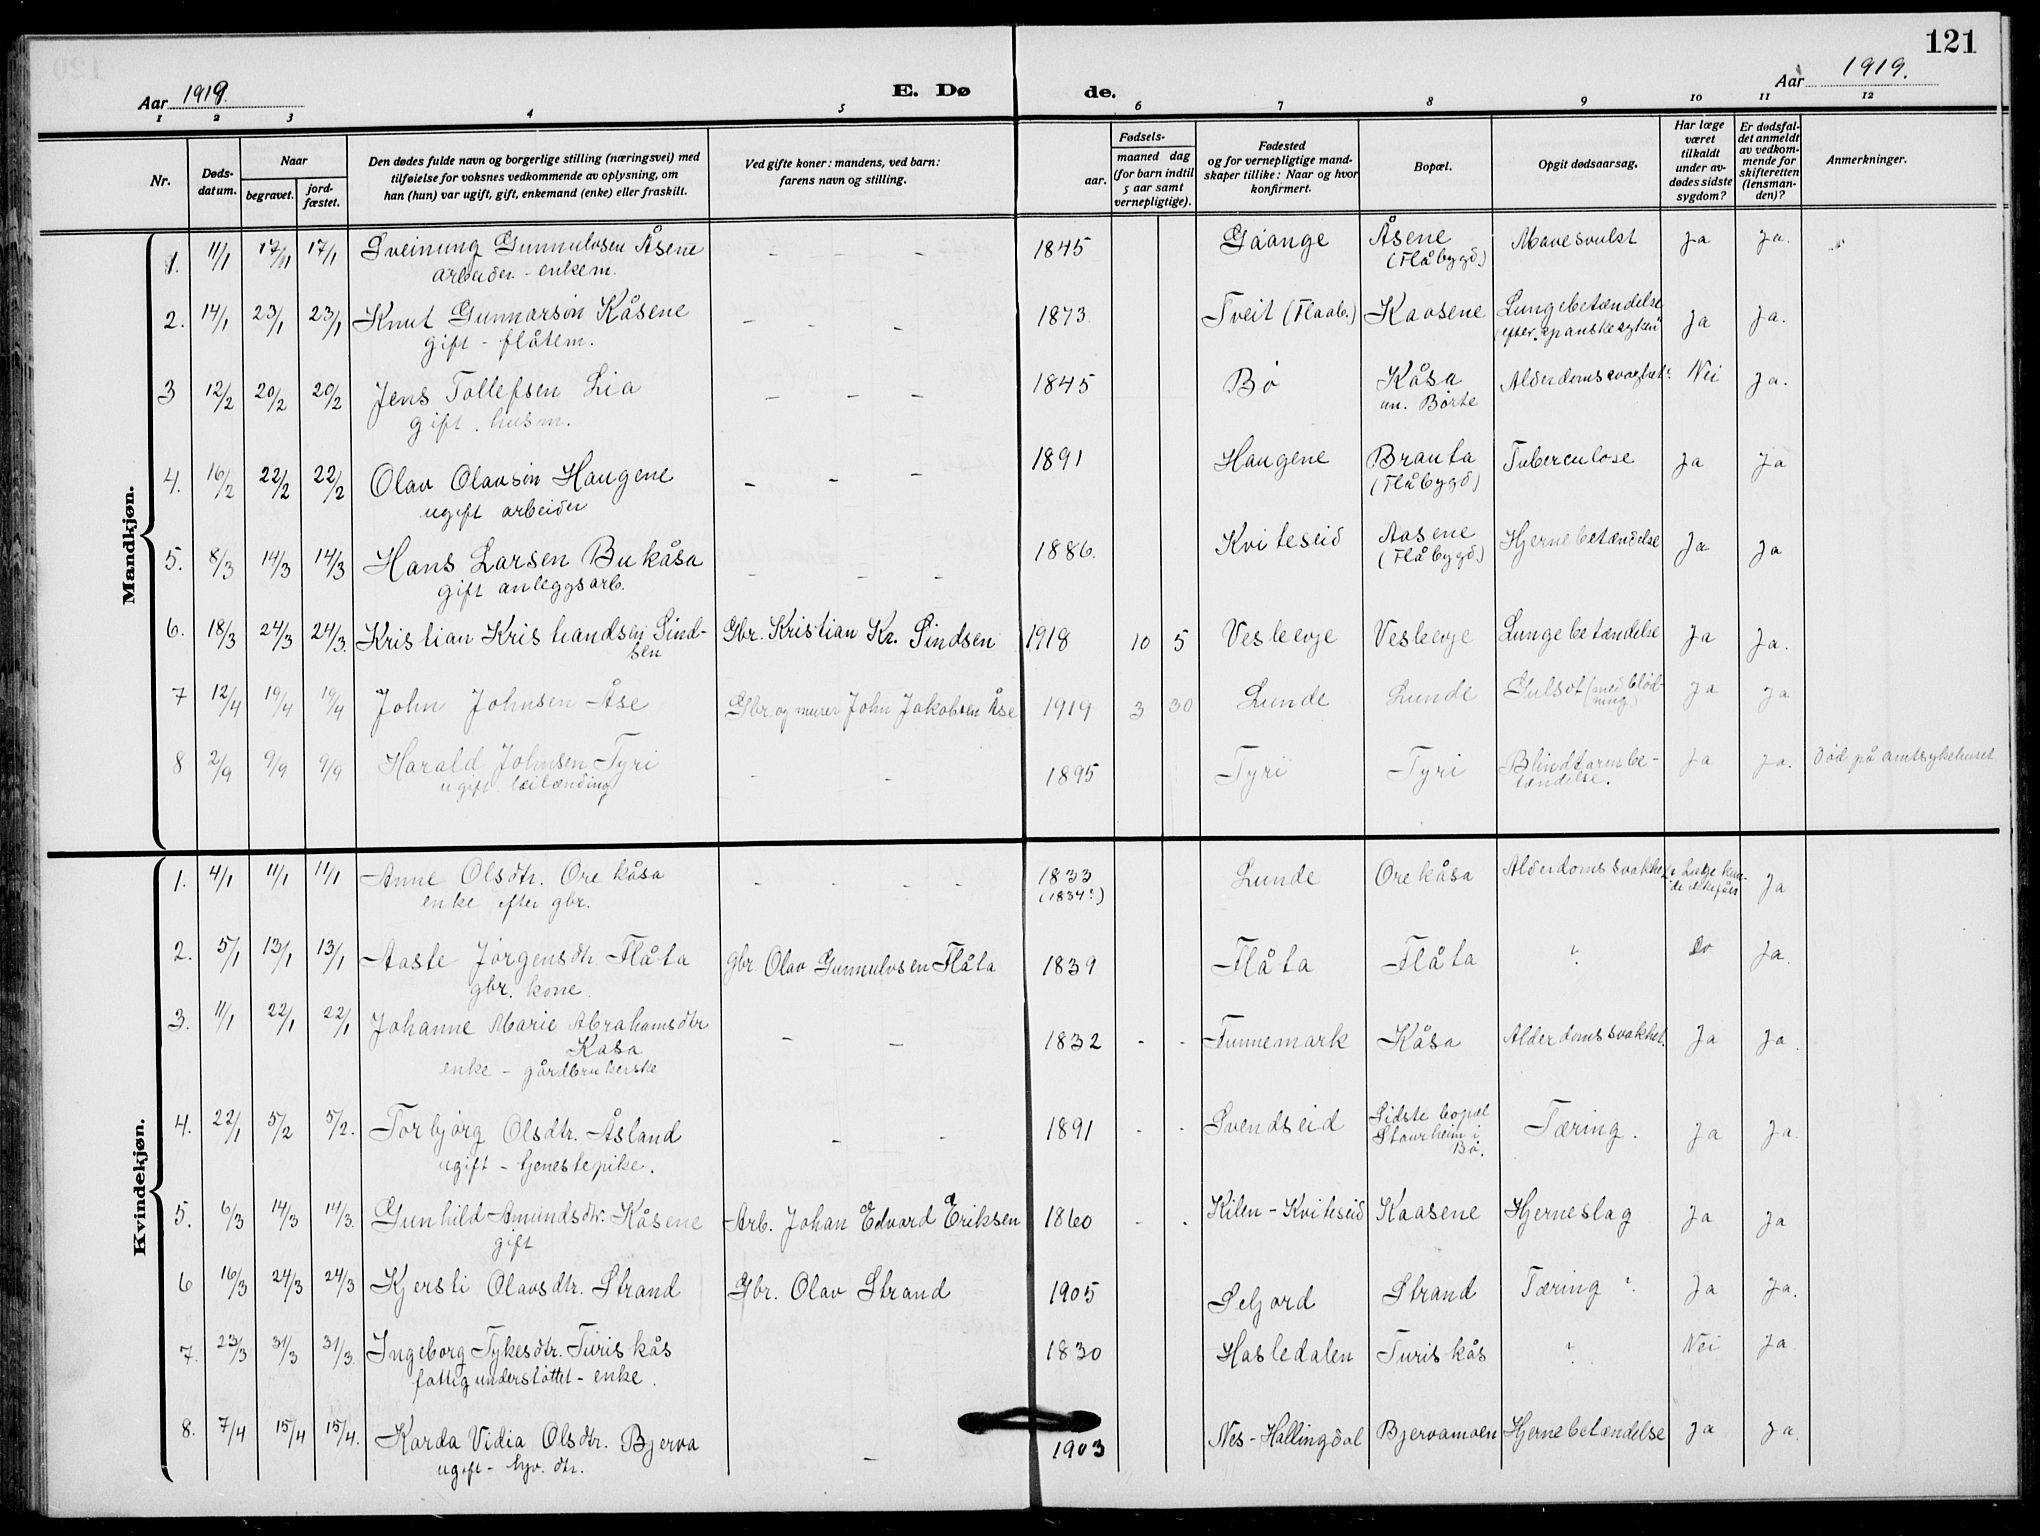 SAKO, Lunde kirkebøker, F/Fa/L0005: Ministerialbok nr. I 5, 1914-1922, s. 121